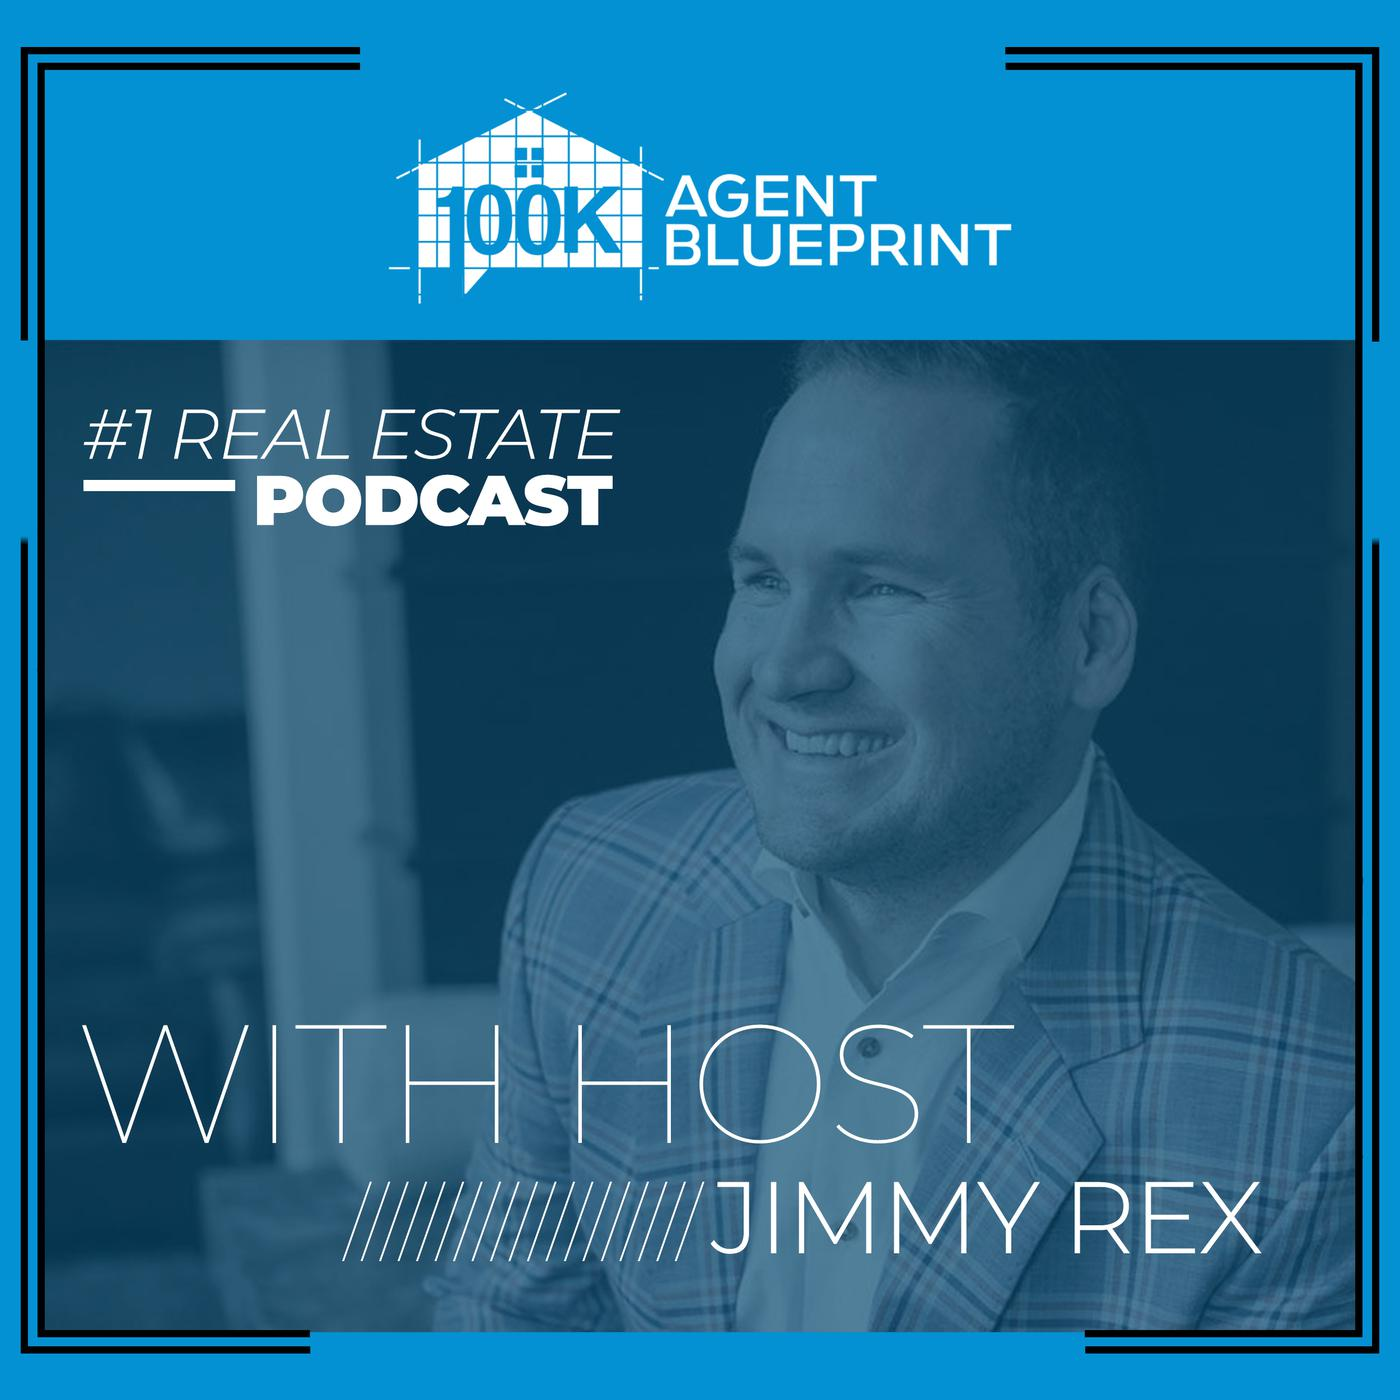 100K Agent Blueprint (podcast) - Jimmy Rex | Listen Notes